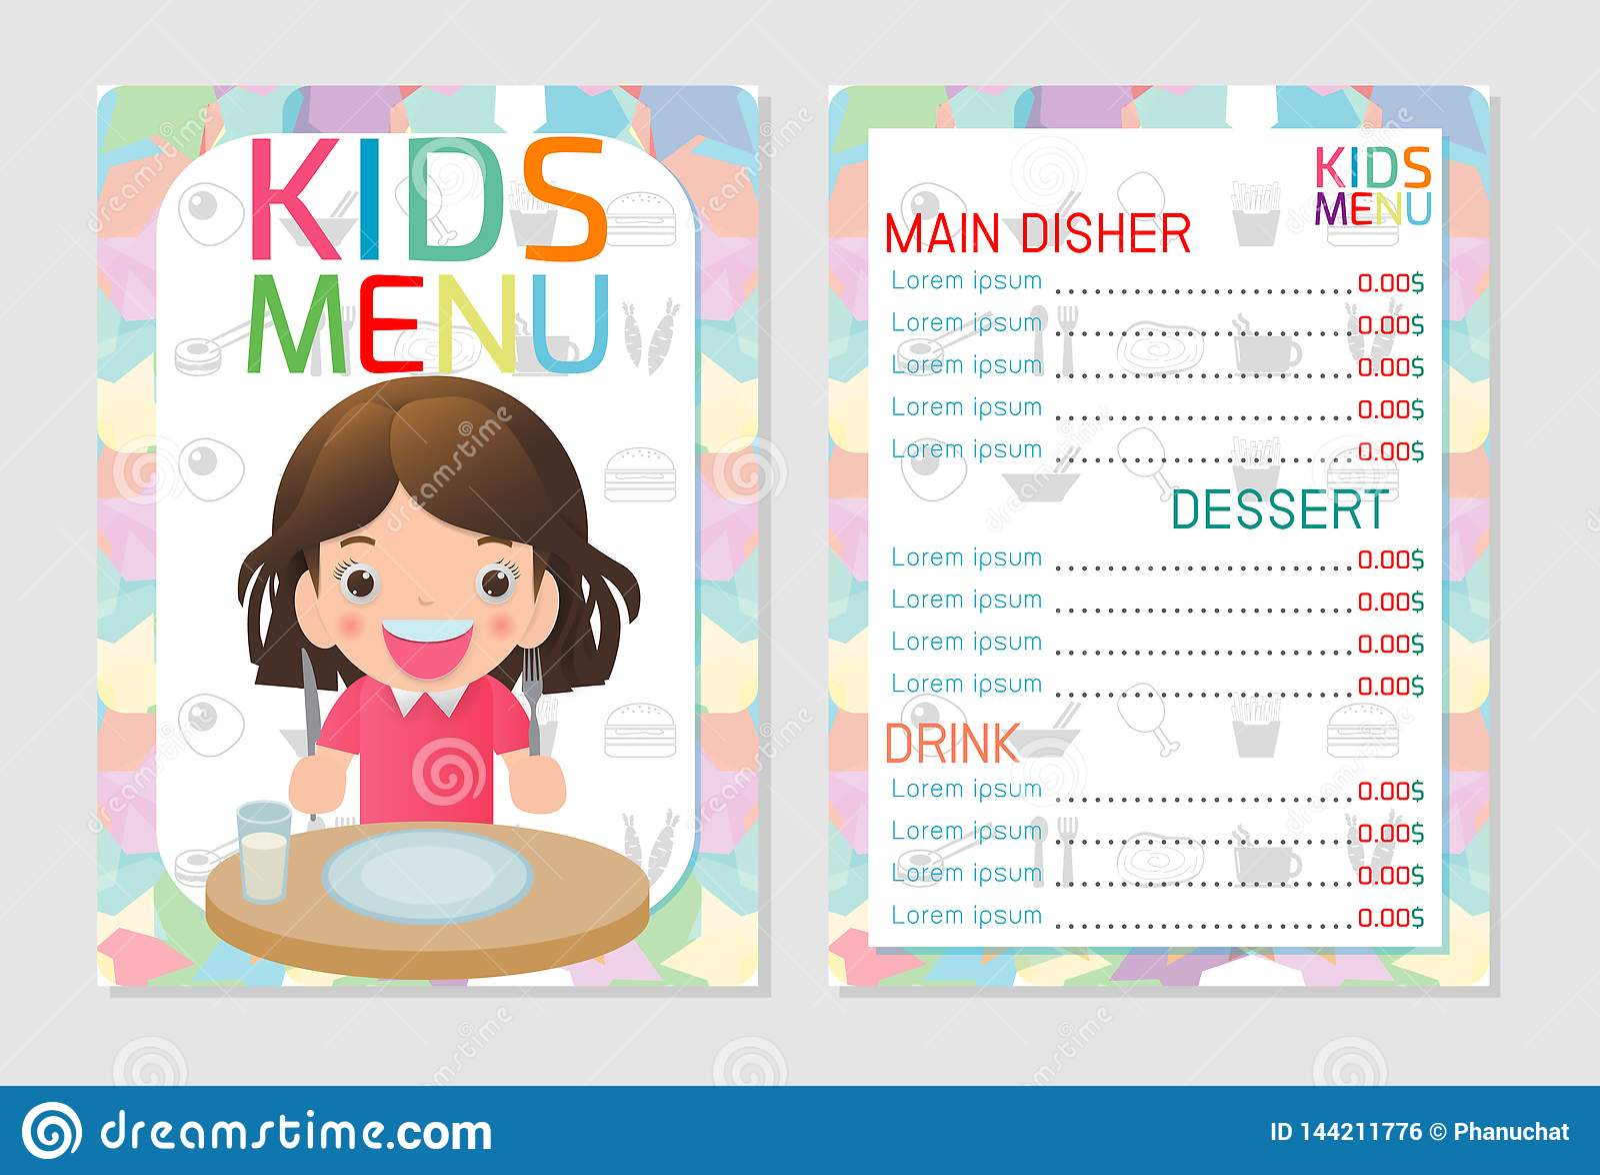 Cute Colorful Kids Meal Menu Template Design Kids